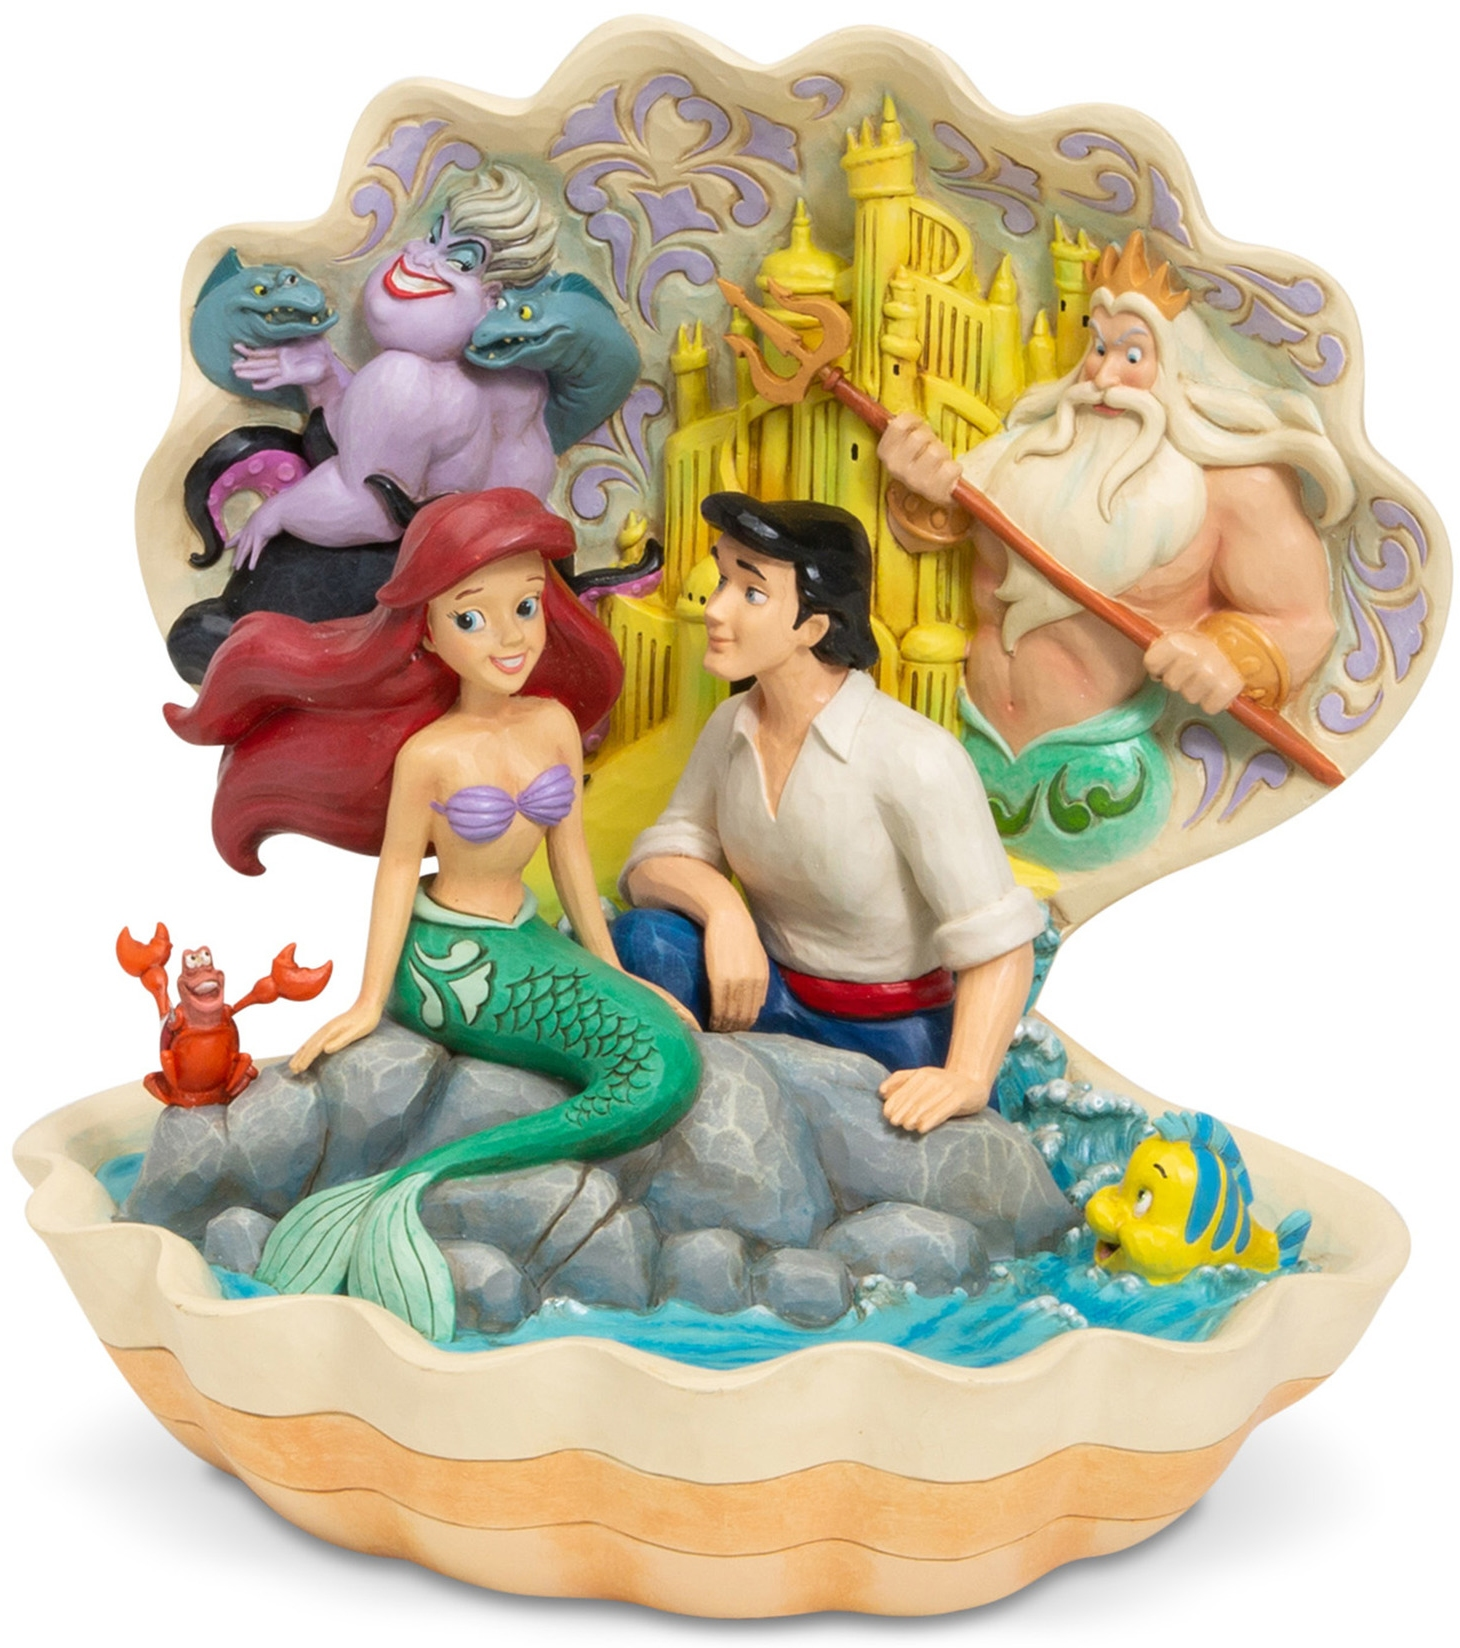 Disney Traditions by Jim Shore 6005956 Little Mermaid Shell Scene Figurine